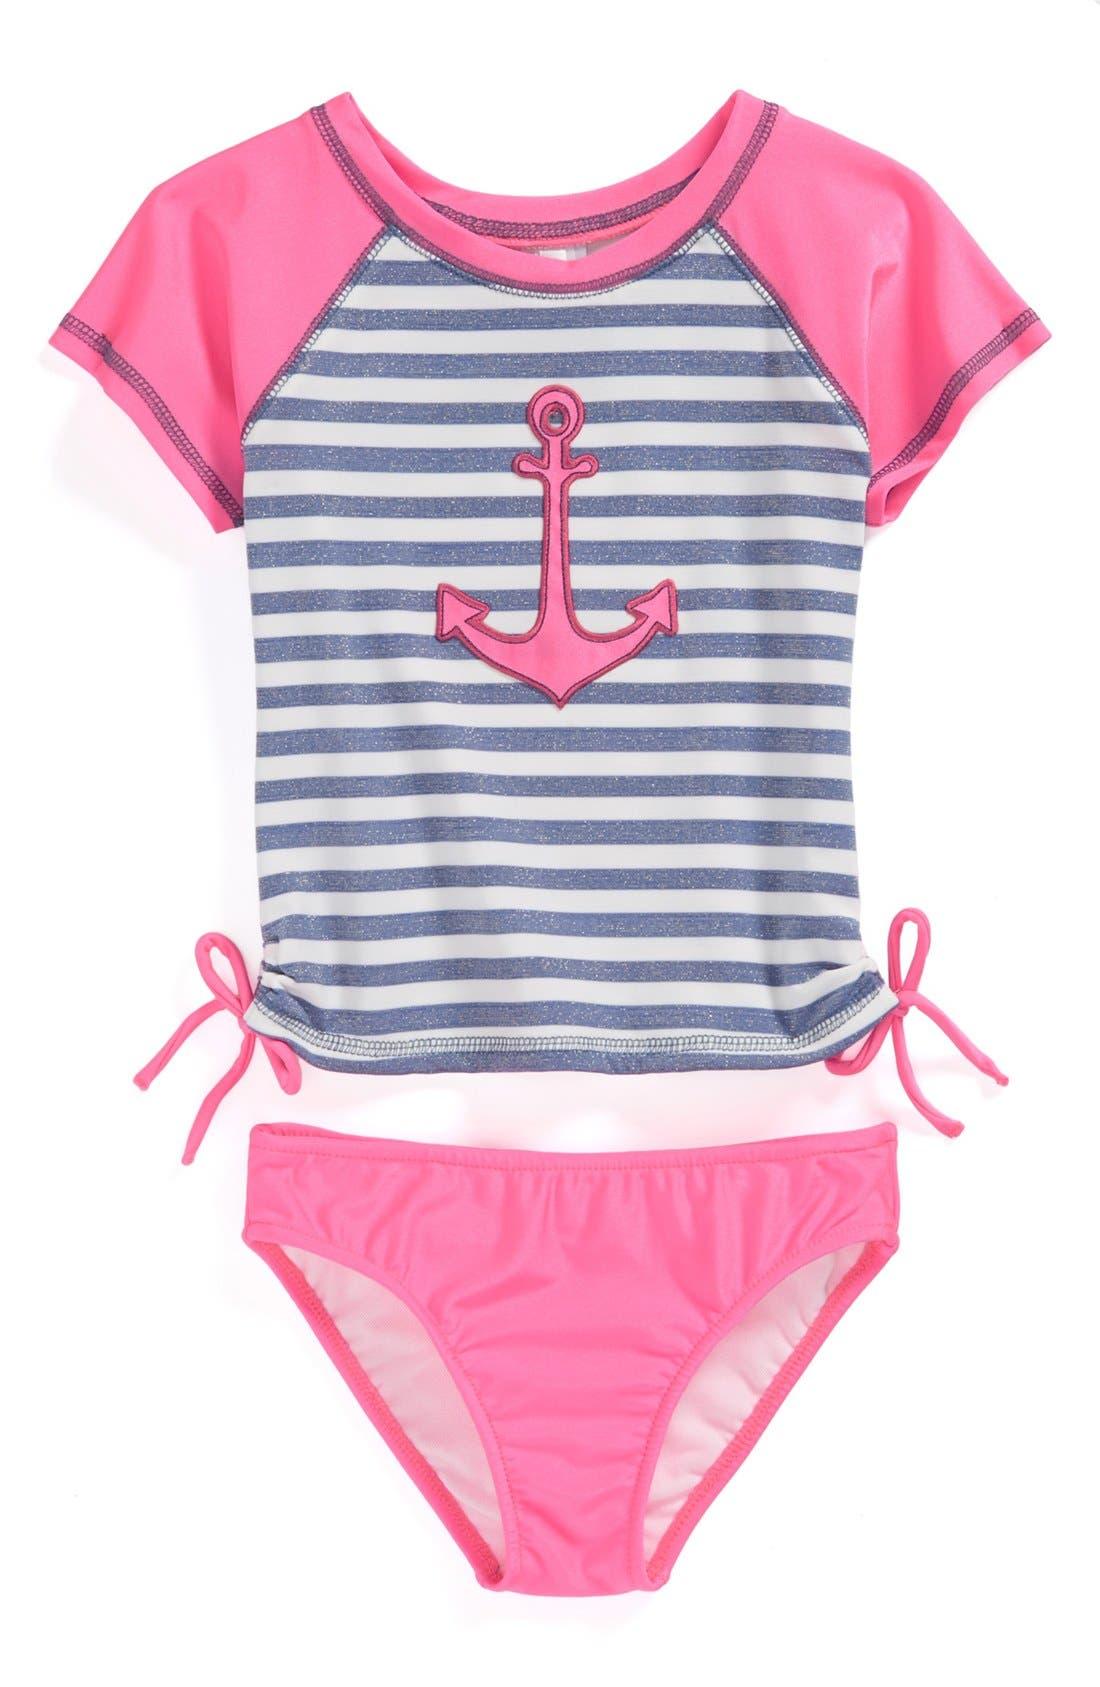 Main Image - Love U Lots 'Anchor' Two-Piece Rashguard Swimsuit (Baby Girls)